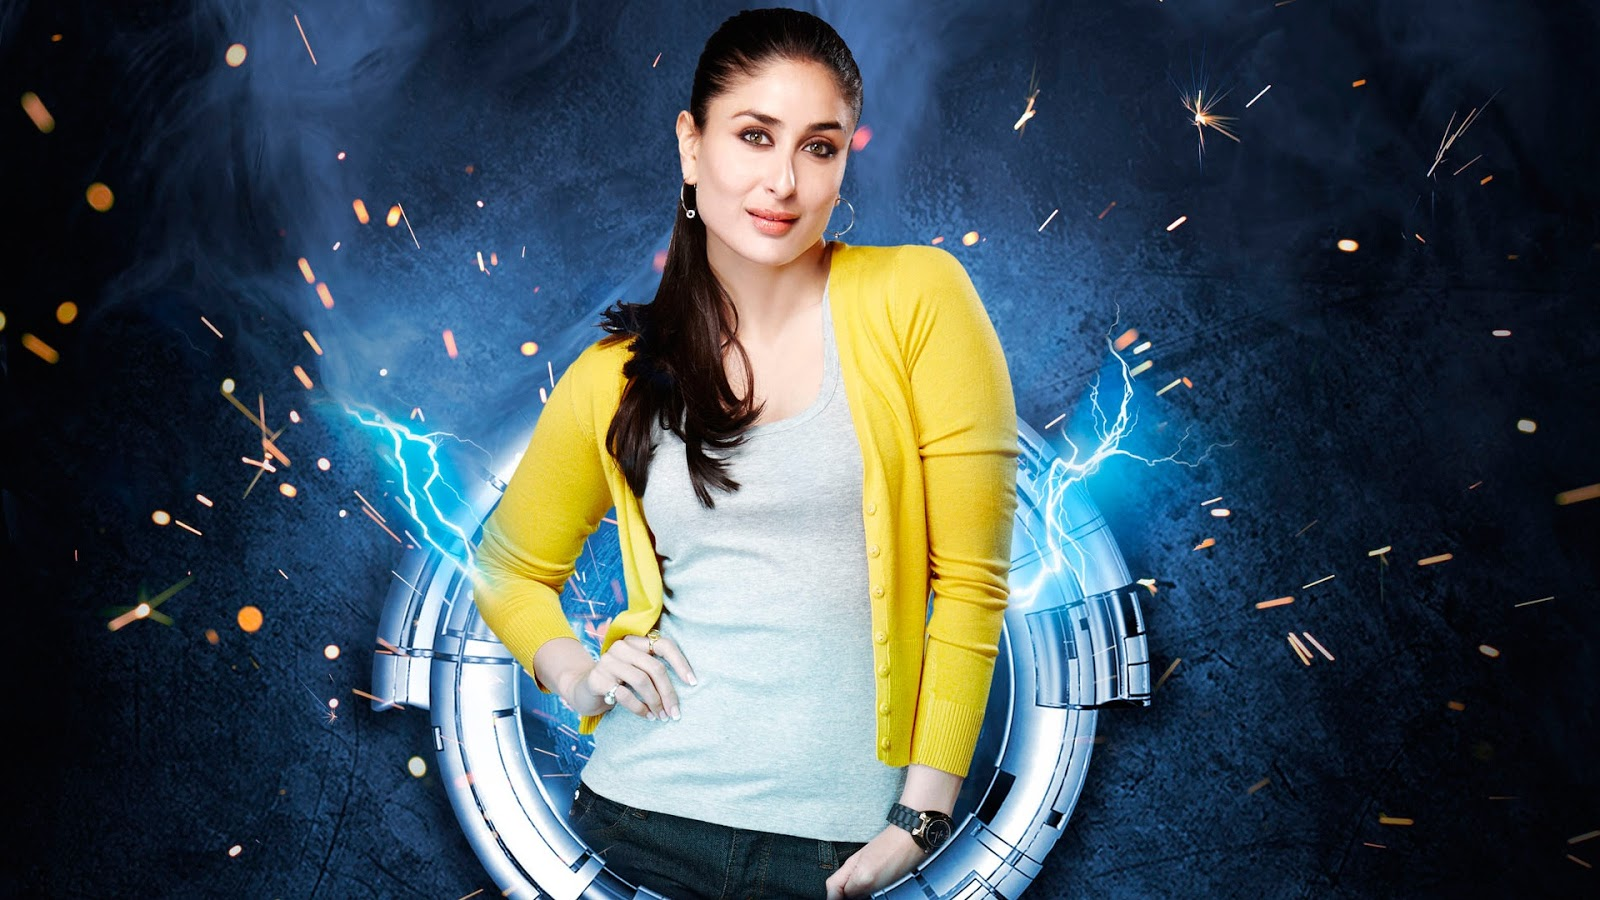 Celebrity Club Kareena Kapoor Hd Wallpapers 1080p